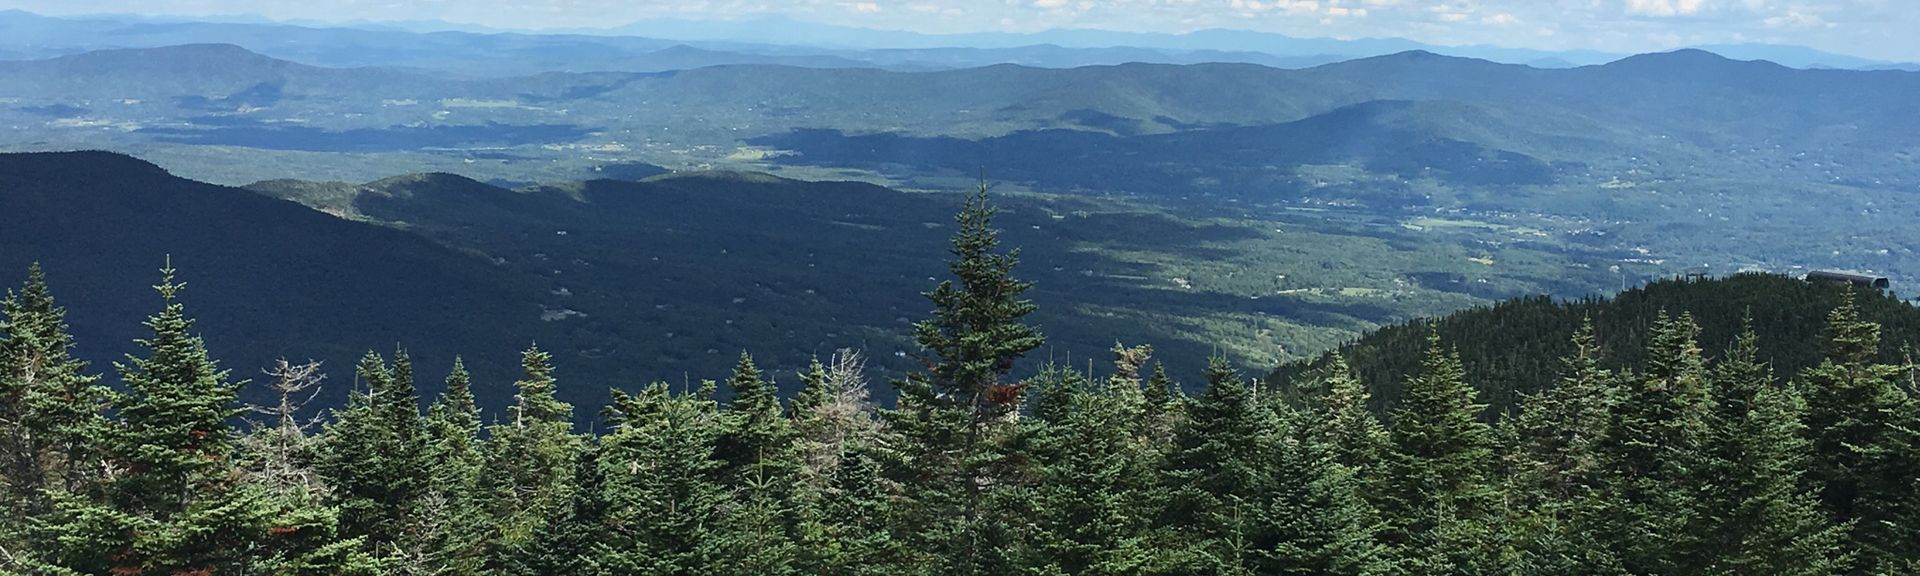 Wolcott, Vermont, United States of America